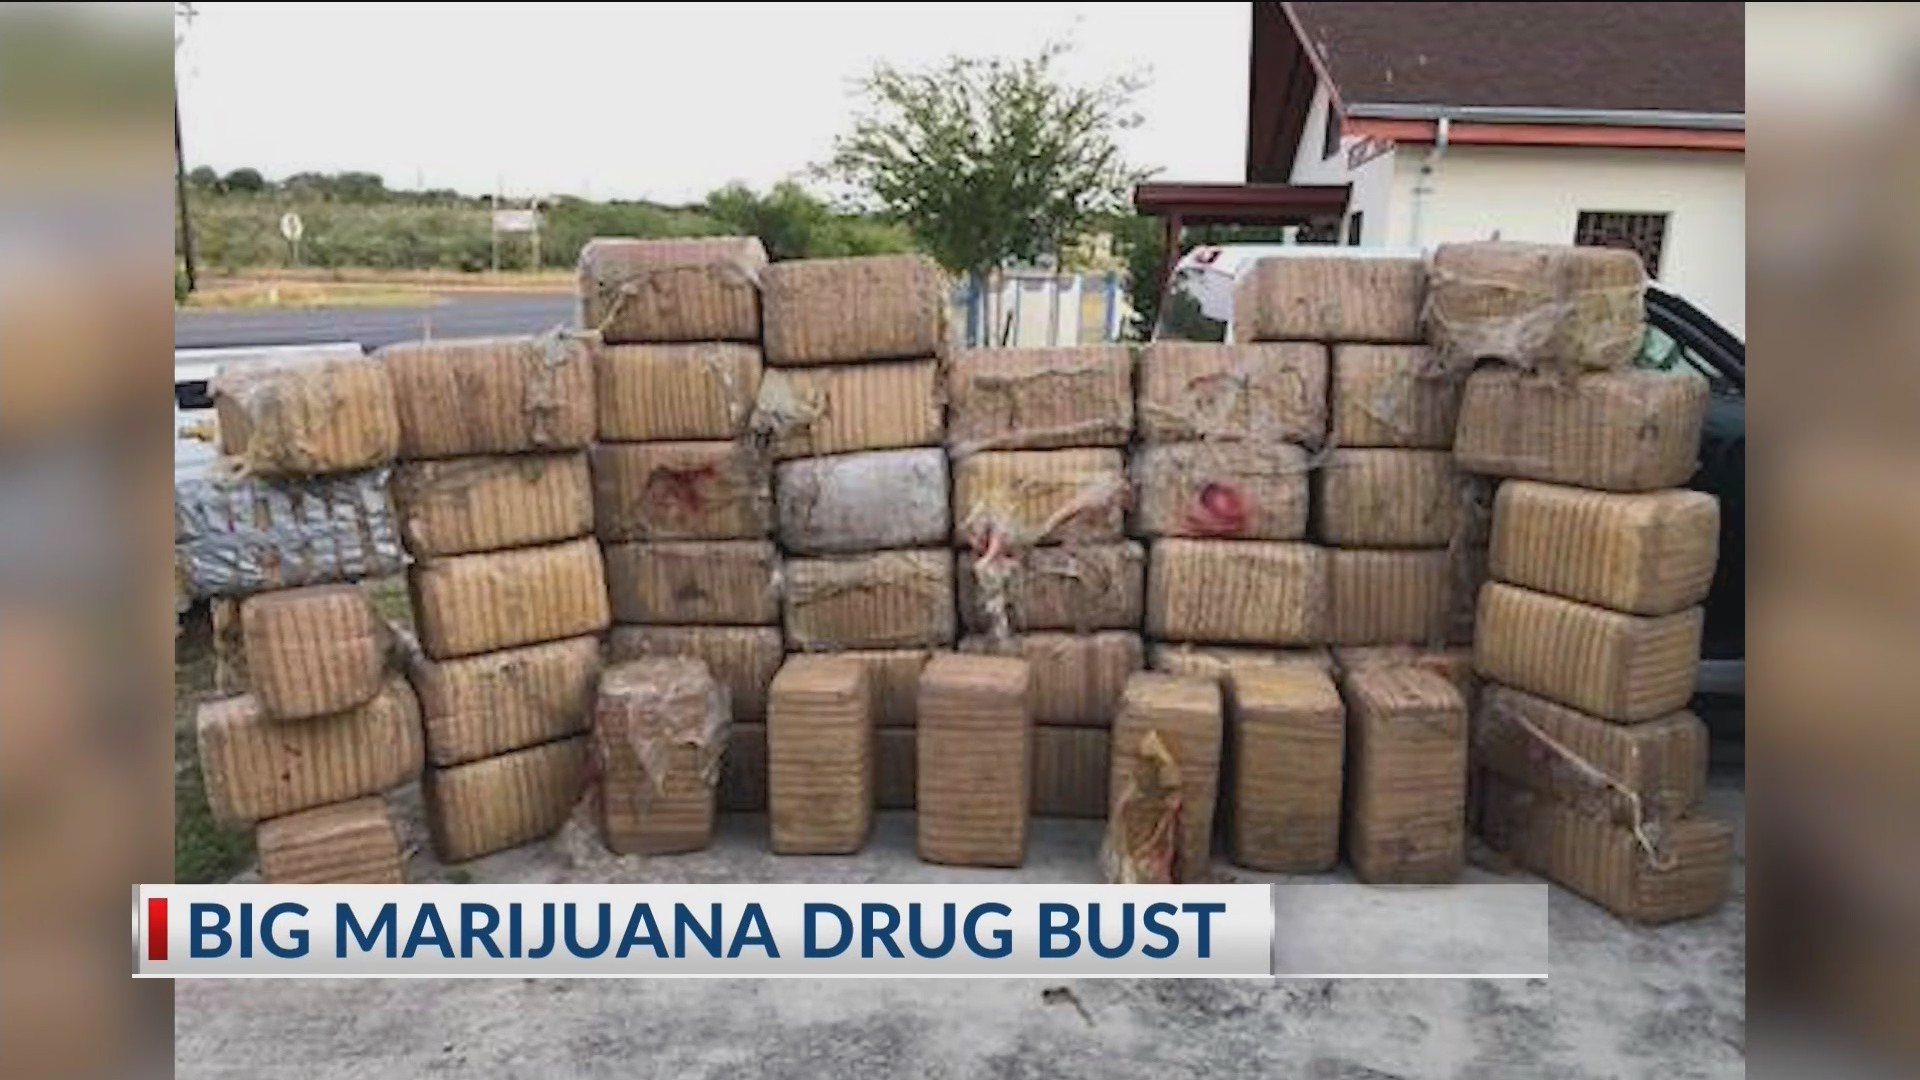 Big marijuana drug bust | KVEO-TV